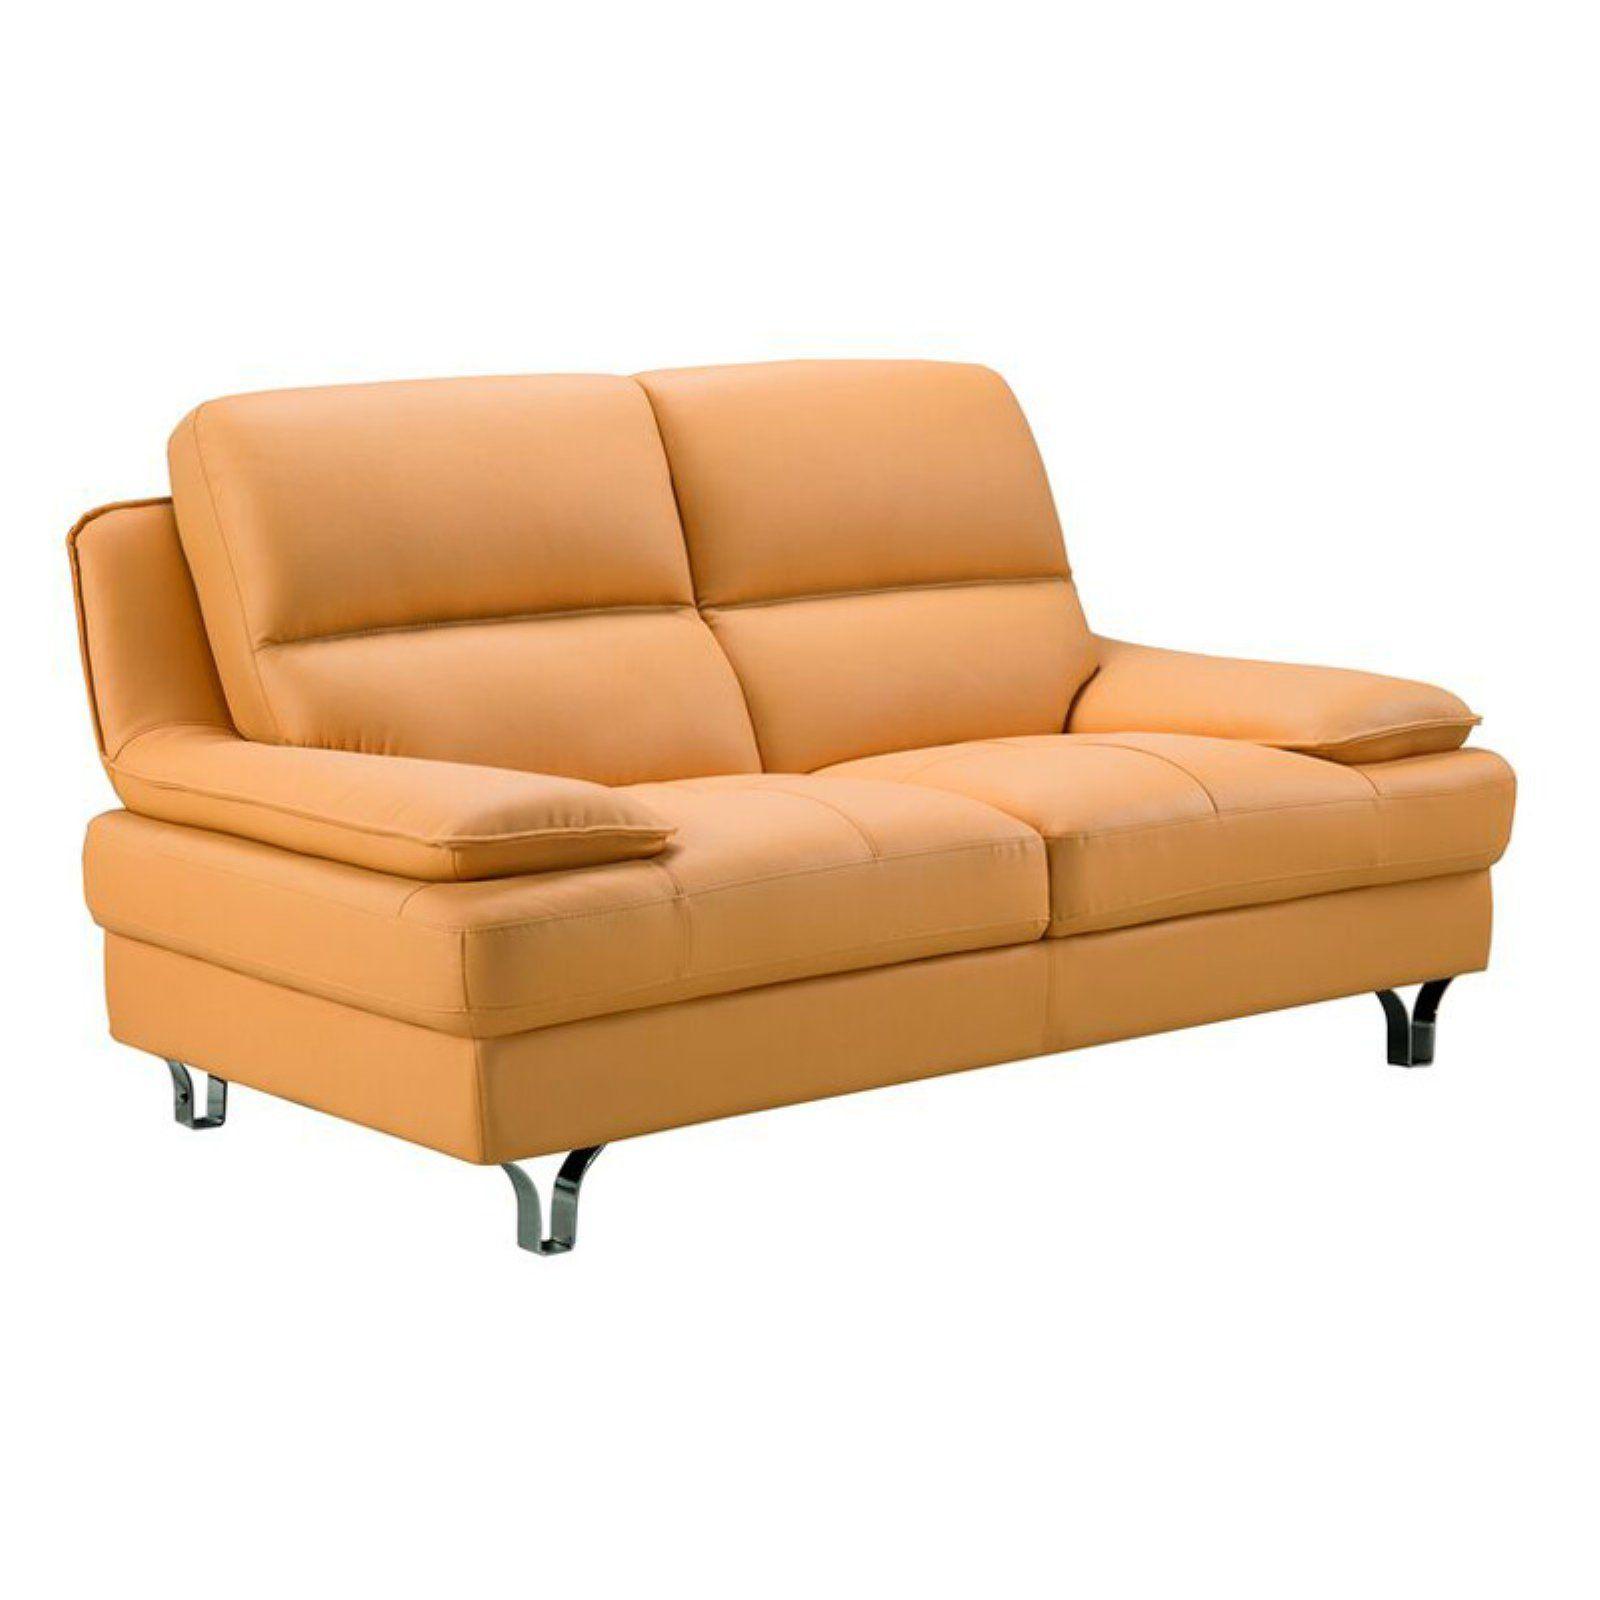 Groovy American Eagle Furniture Harrison Loveseat Yellow Products Creativecarmelina Interior Chair Design Creativecarmelinacom